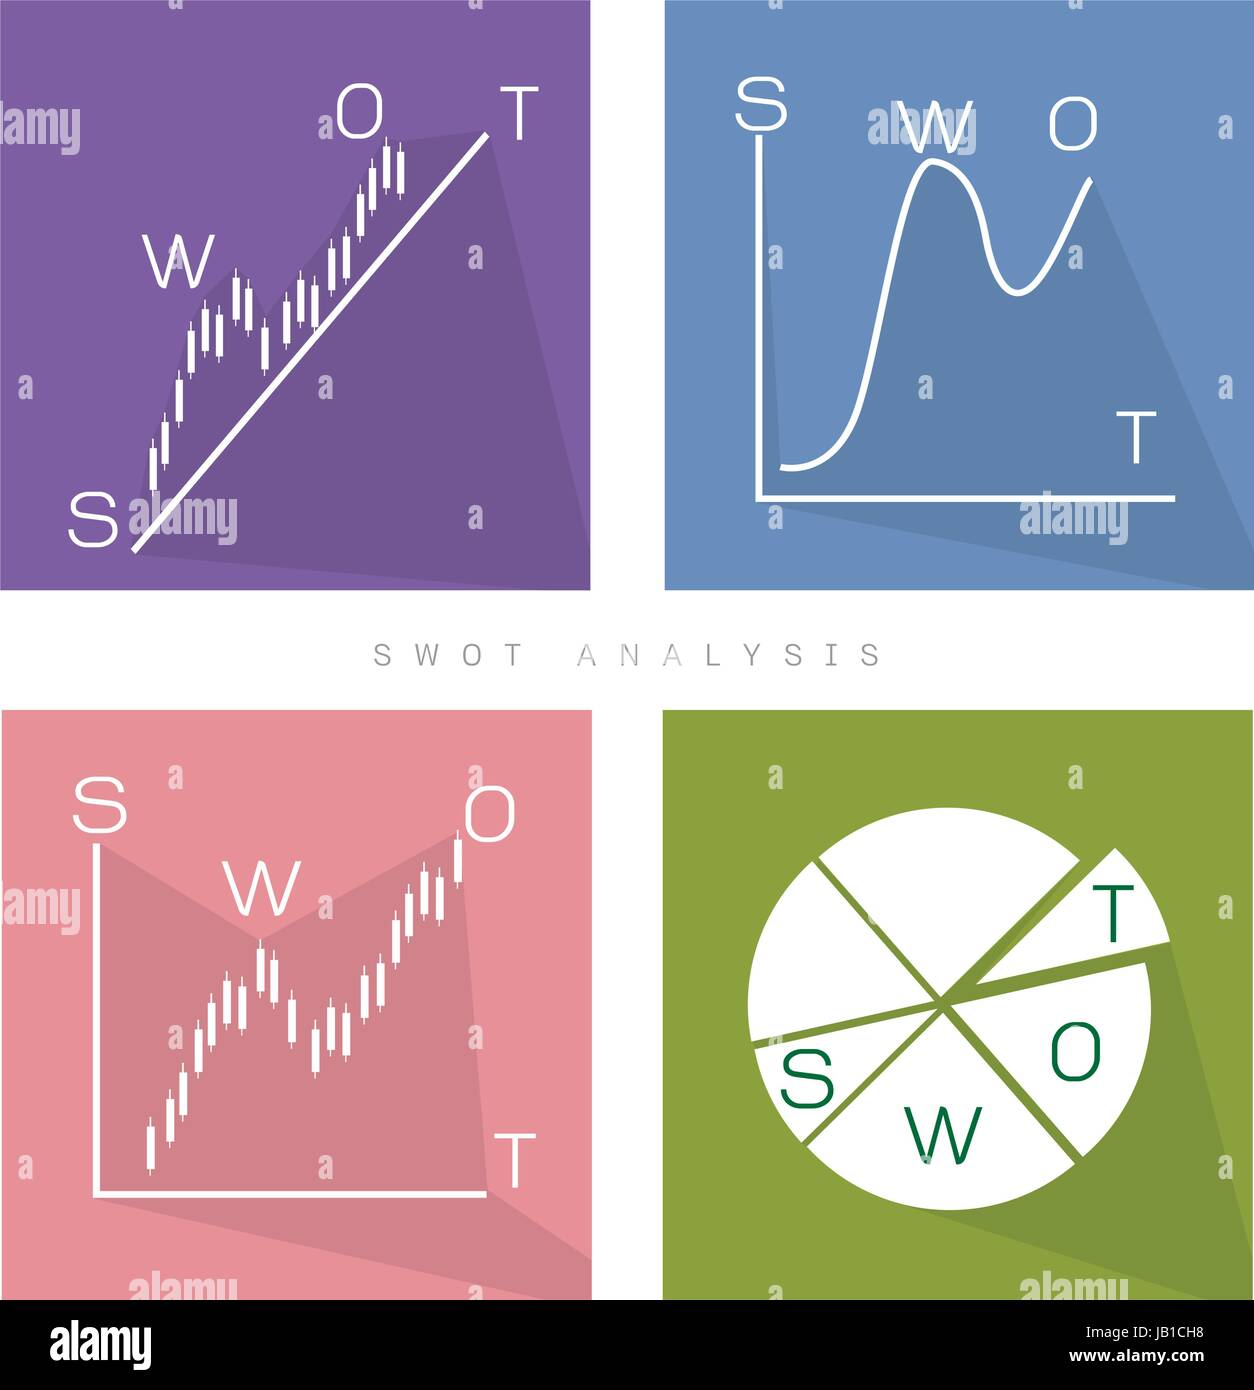 swot analysis graph